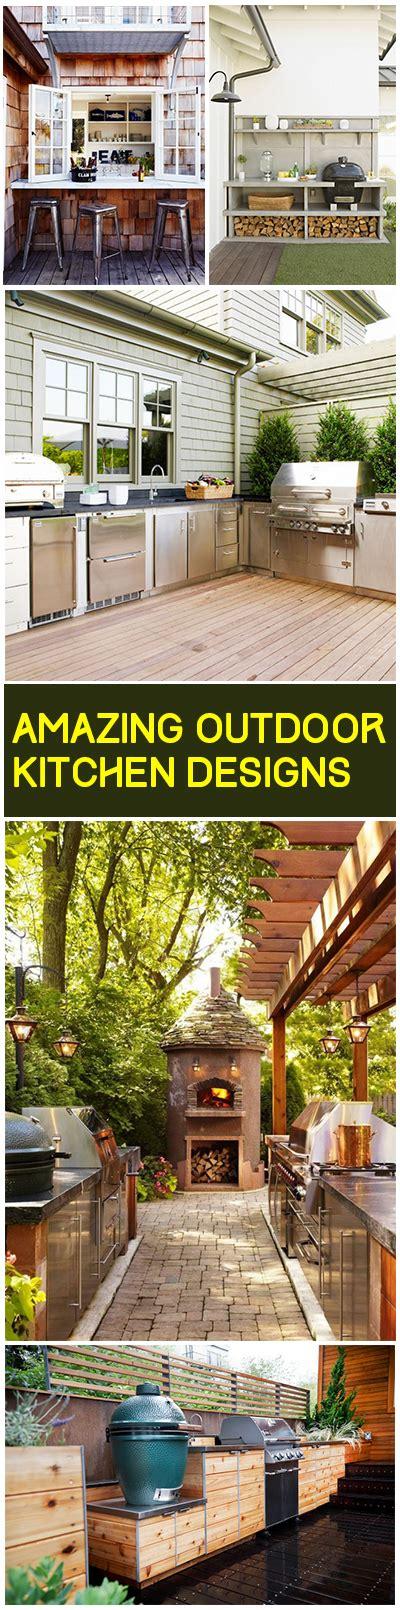 Amazing Outdoor Kitchen Designs amazing outdoor kitchen ideas bless my weeds